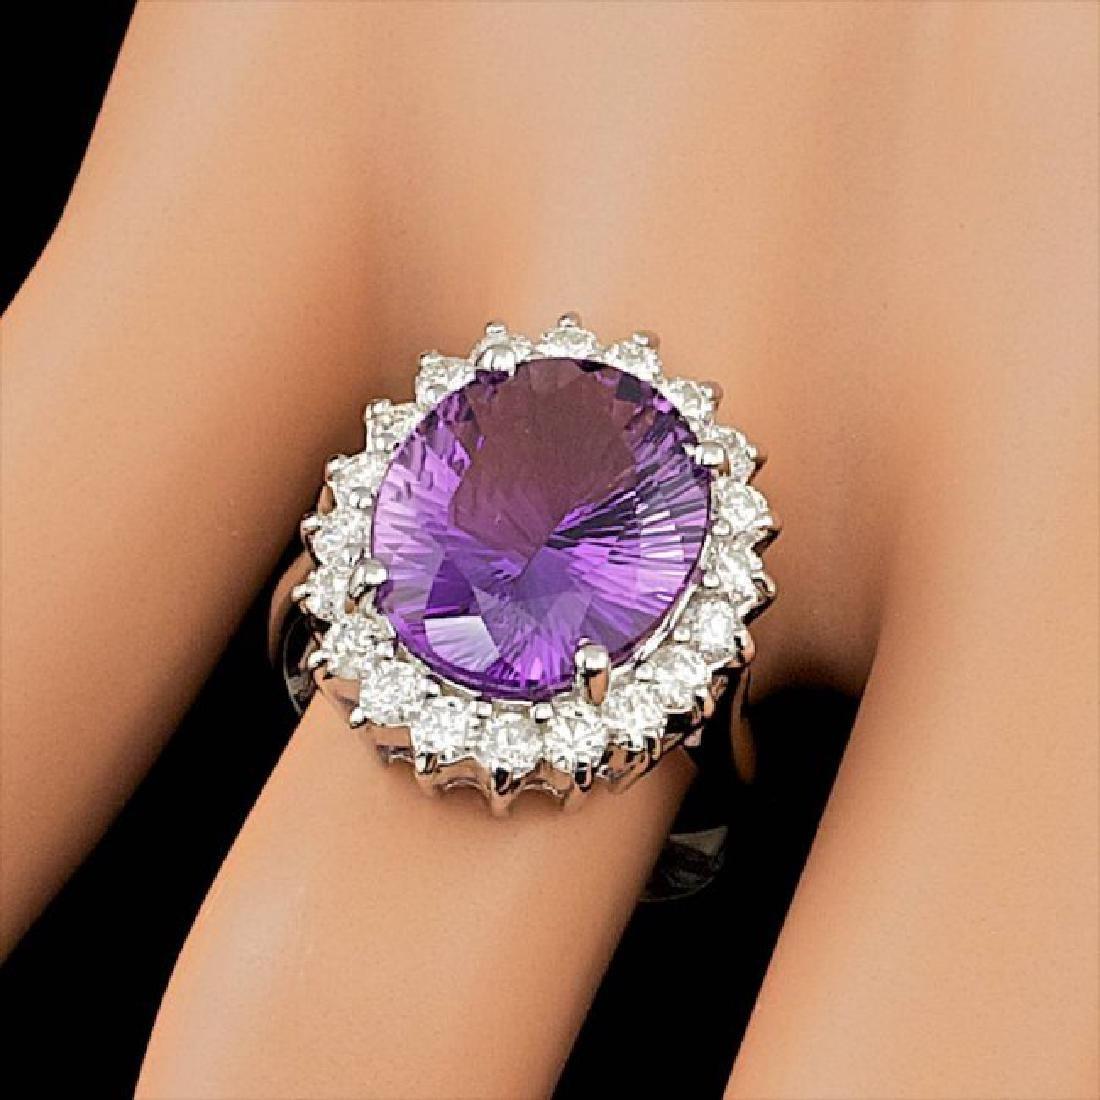 14k Gold 5.00ct Amethyst 1.00ct Diamond Ring - 4